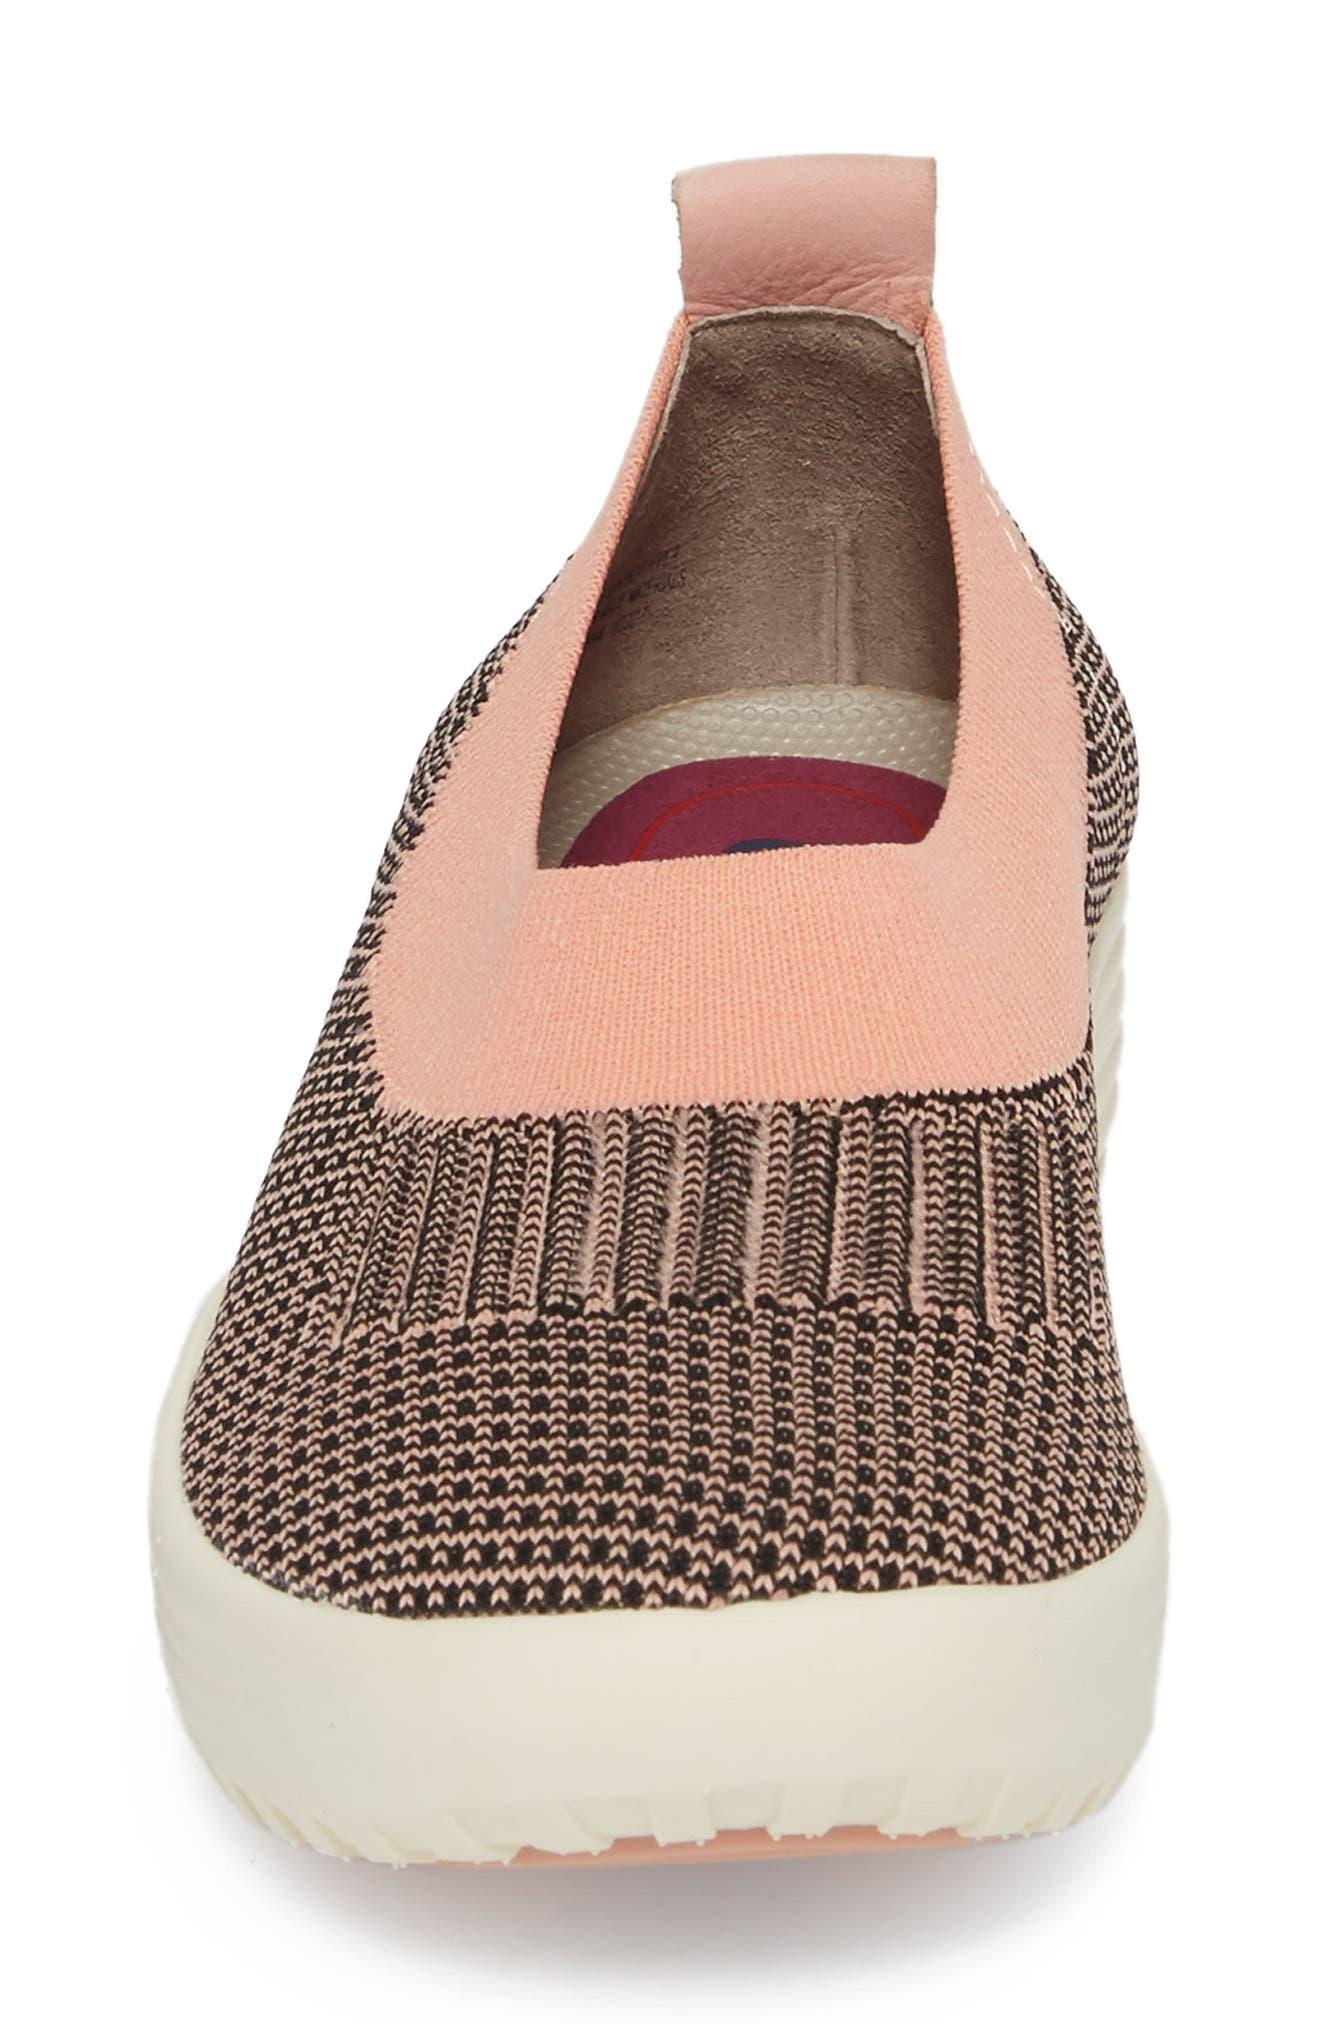 Merigold Slip-On Sock Fit Sneaker,                             Alternate thumbnail 4, color,                             Pink/ Black Knit Fabric